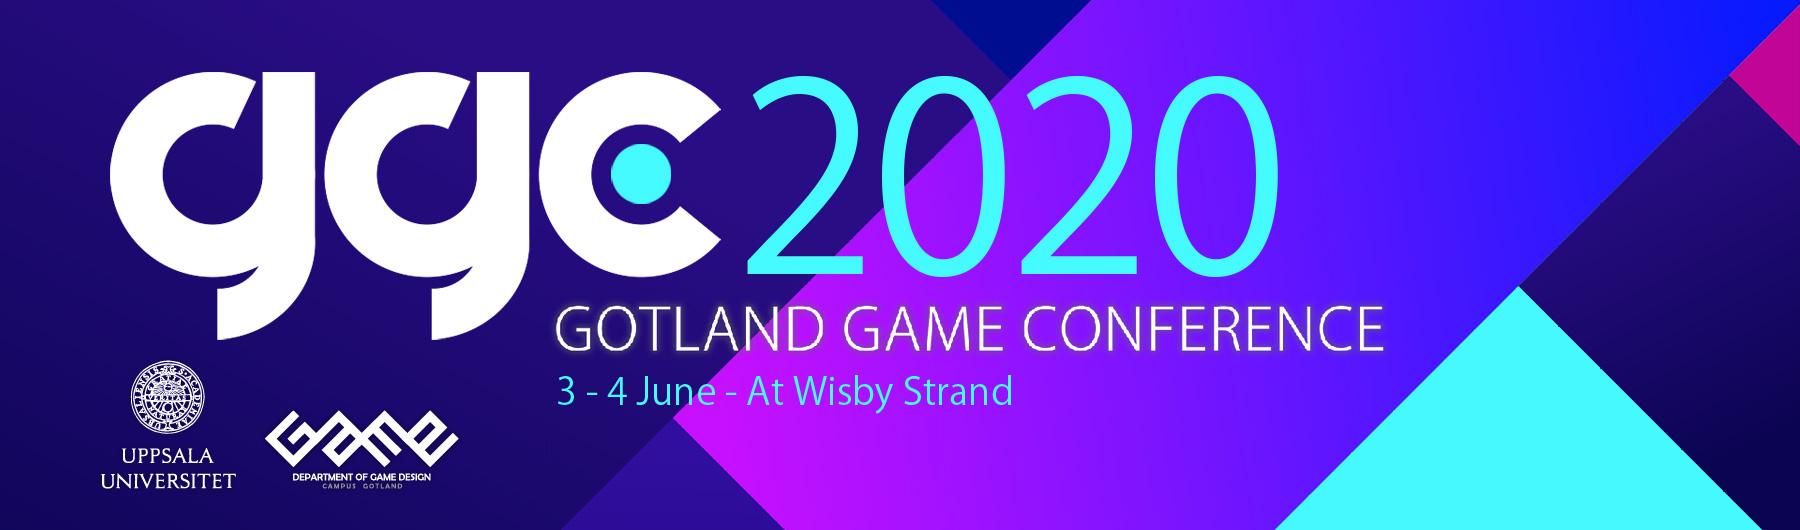 Gotland Game Conference 2020